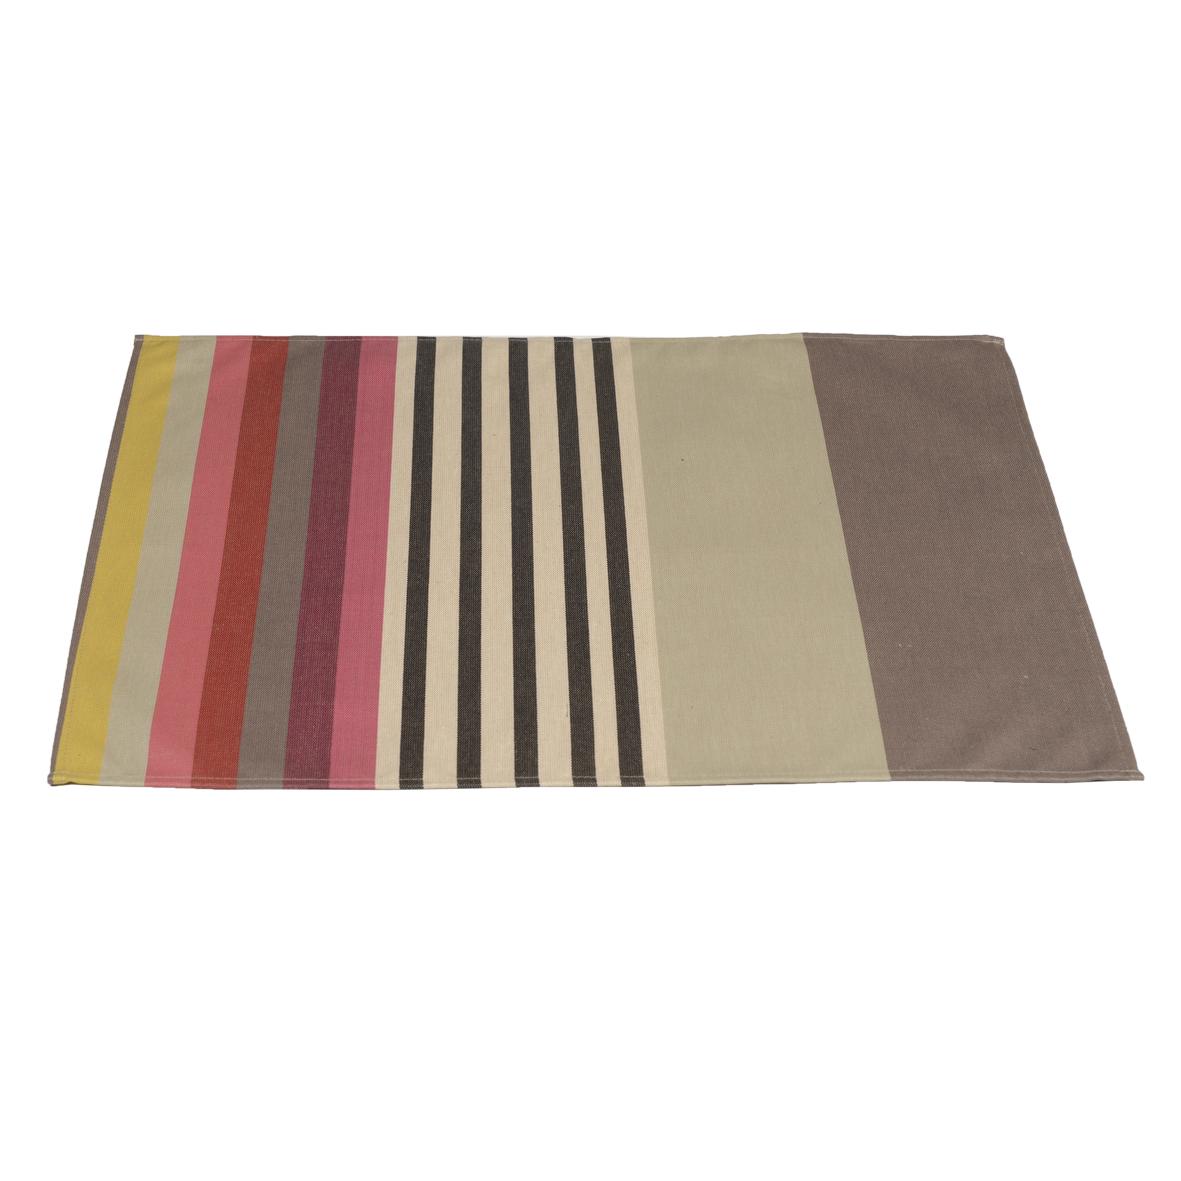 set-de-table-enduit-larrau_TOENSETOS1-0741-1